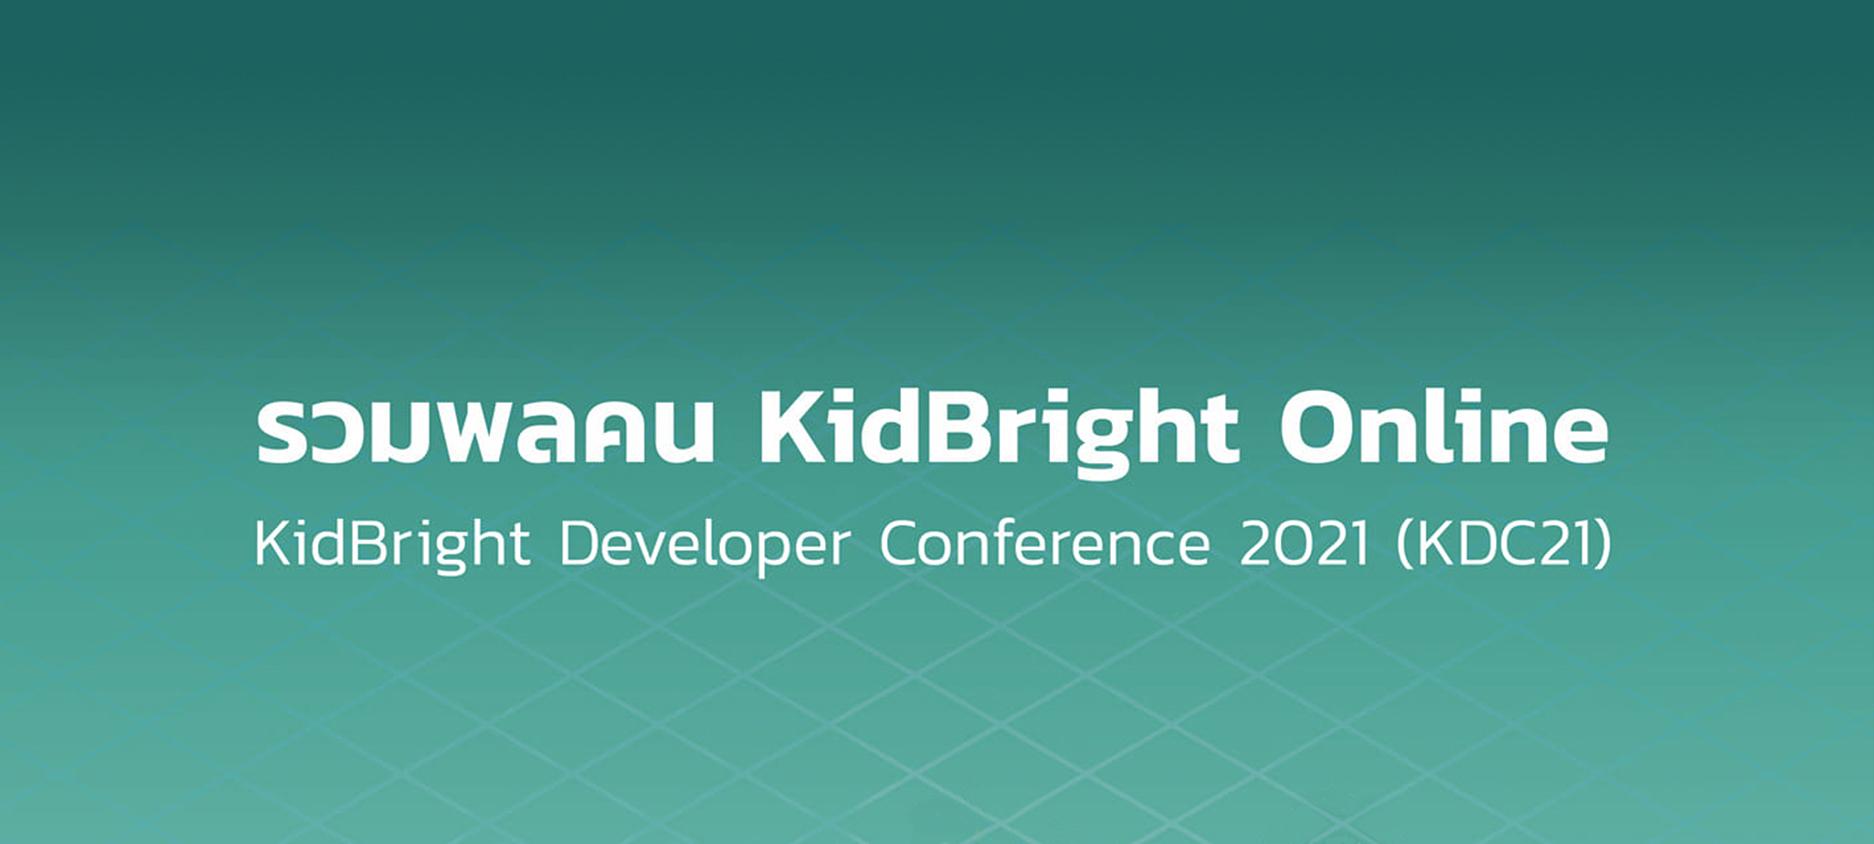 KidBright Developer Conference 2021(KDC21)